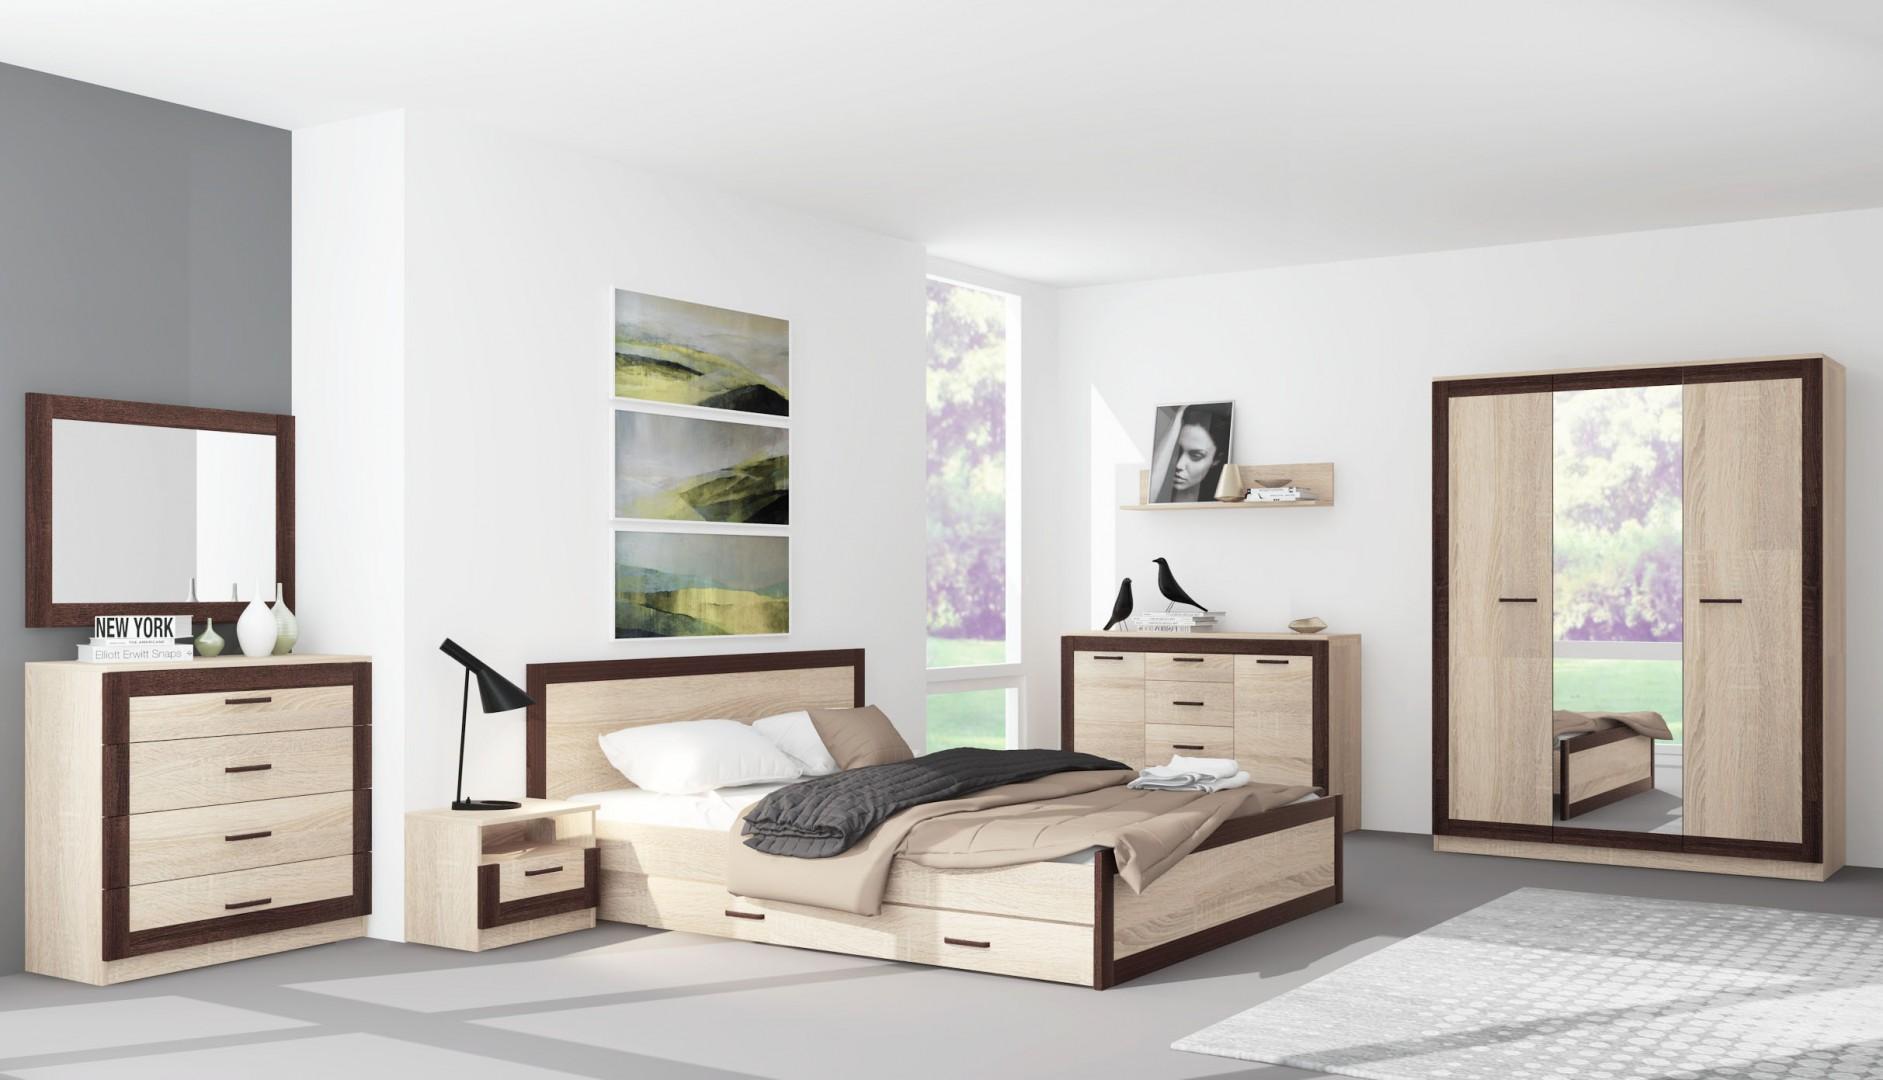 Guļamistabas kolekcija BNBS